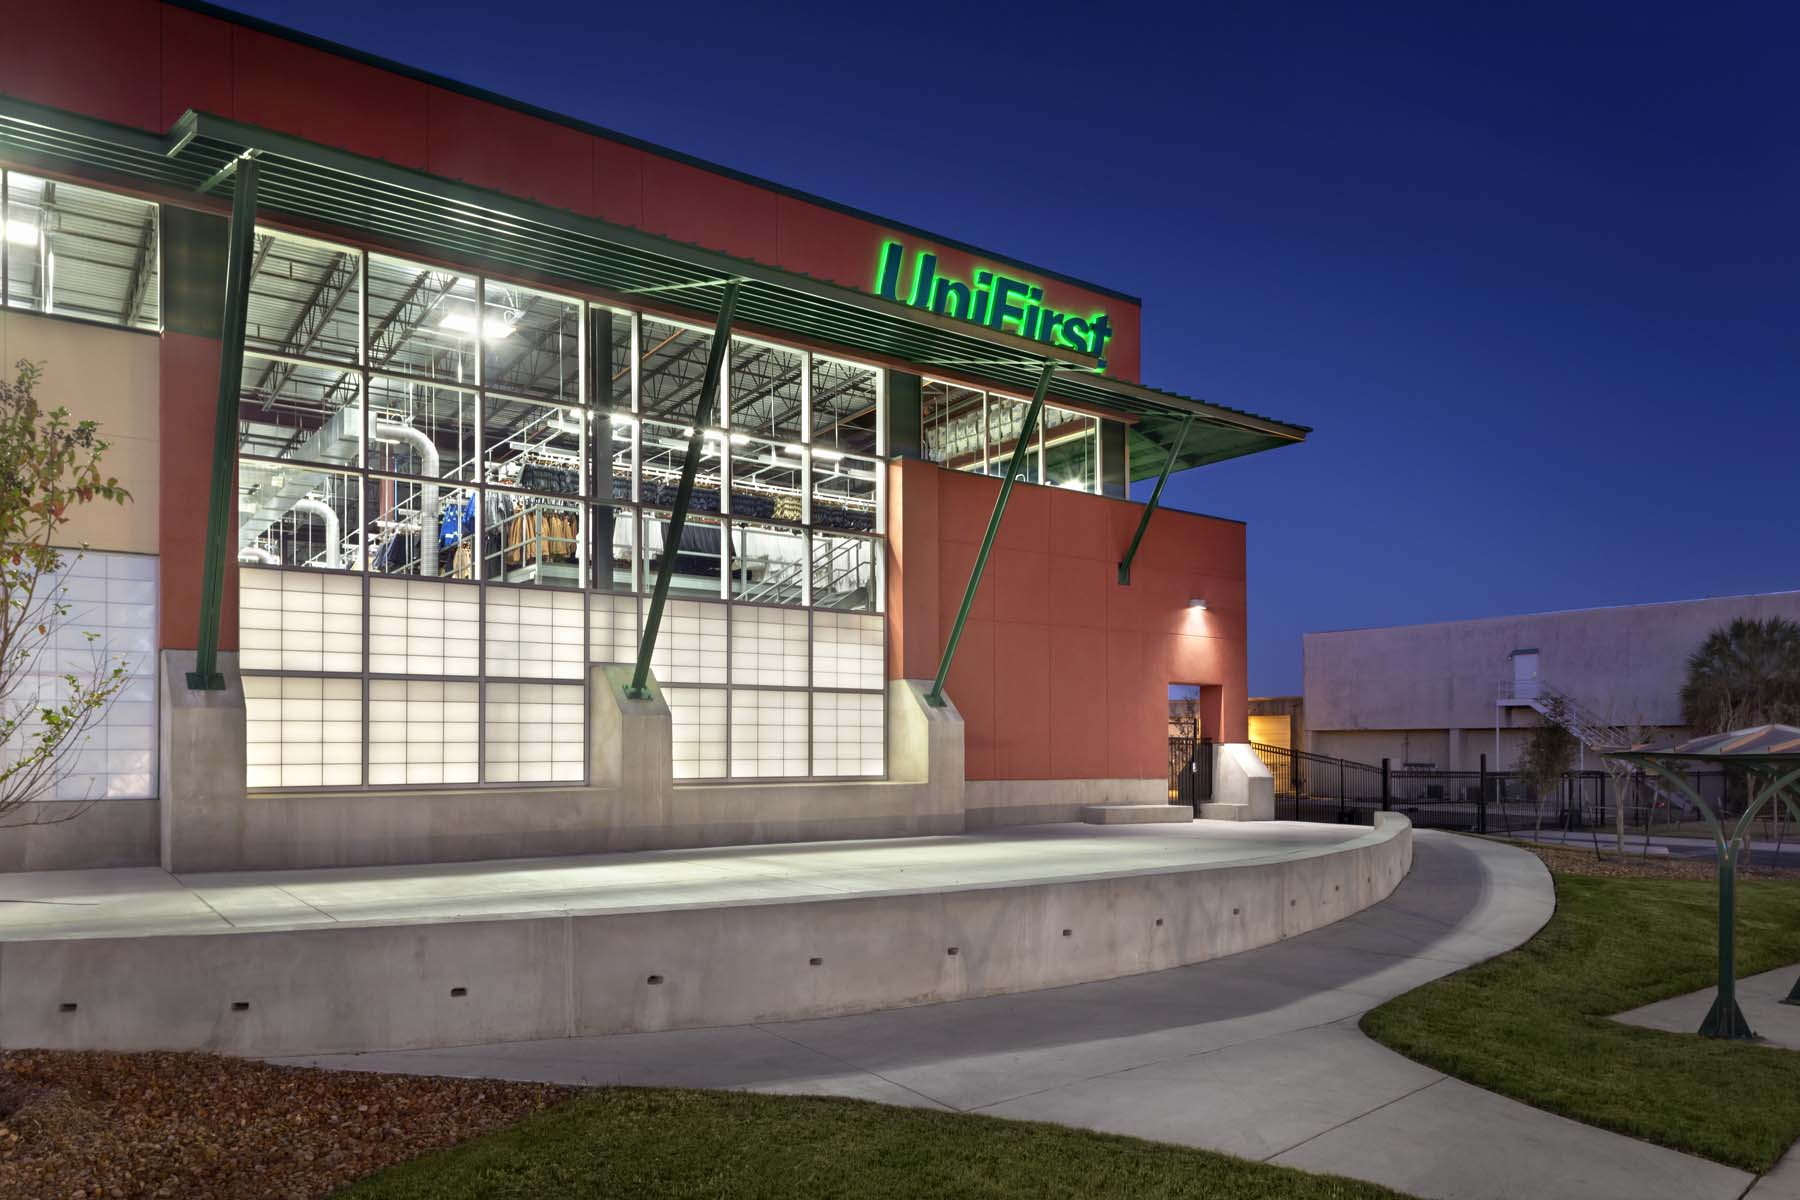 Unifirst Corporation 4